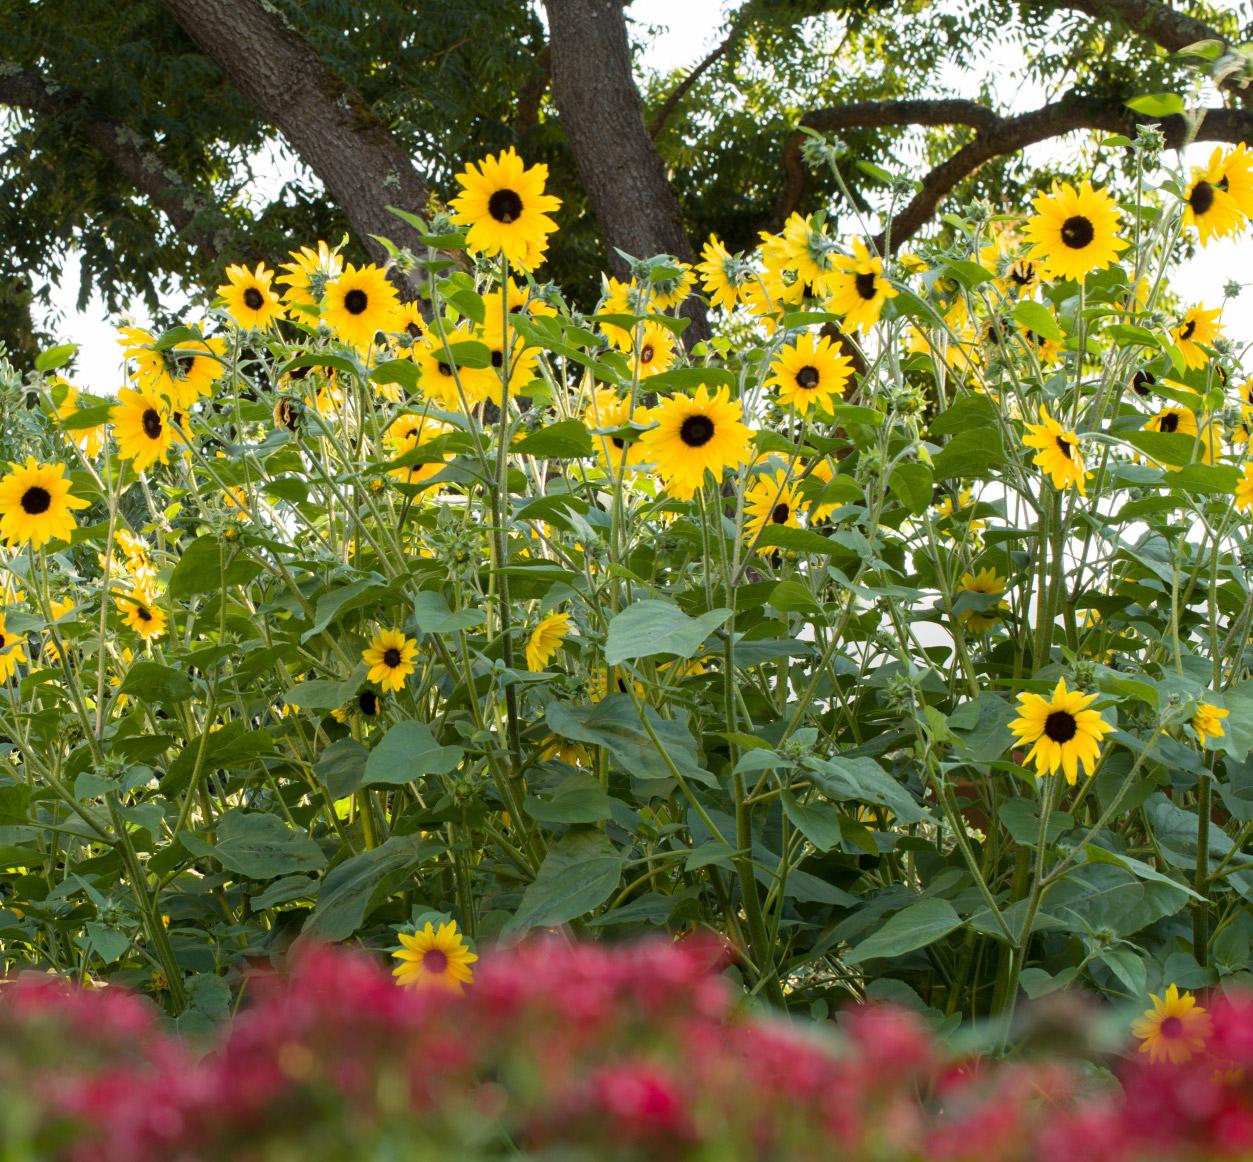 "'Sunfinity"" Sunflower"